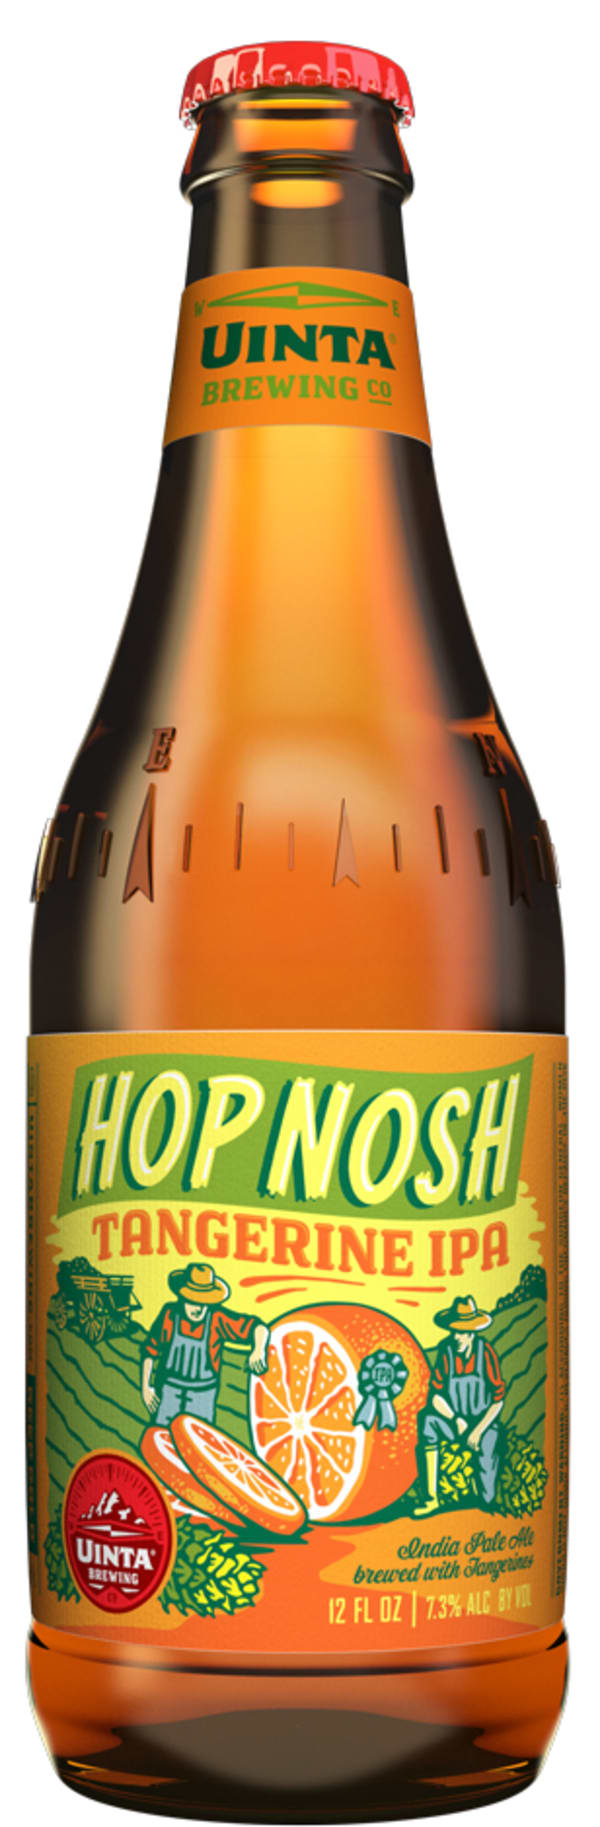 Hop Nosh Tangerine IPA